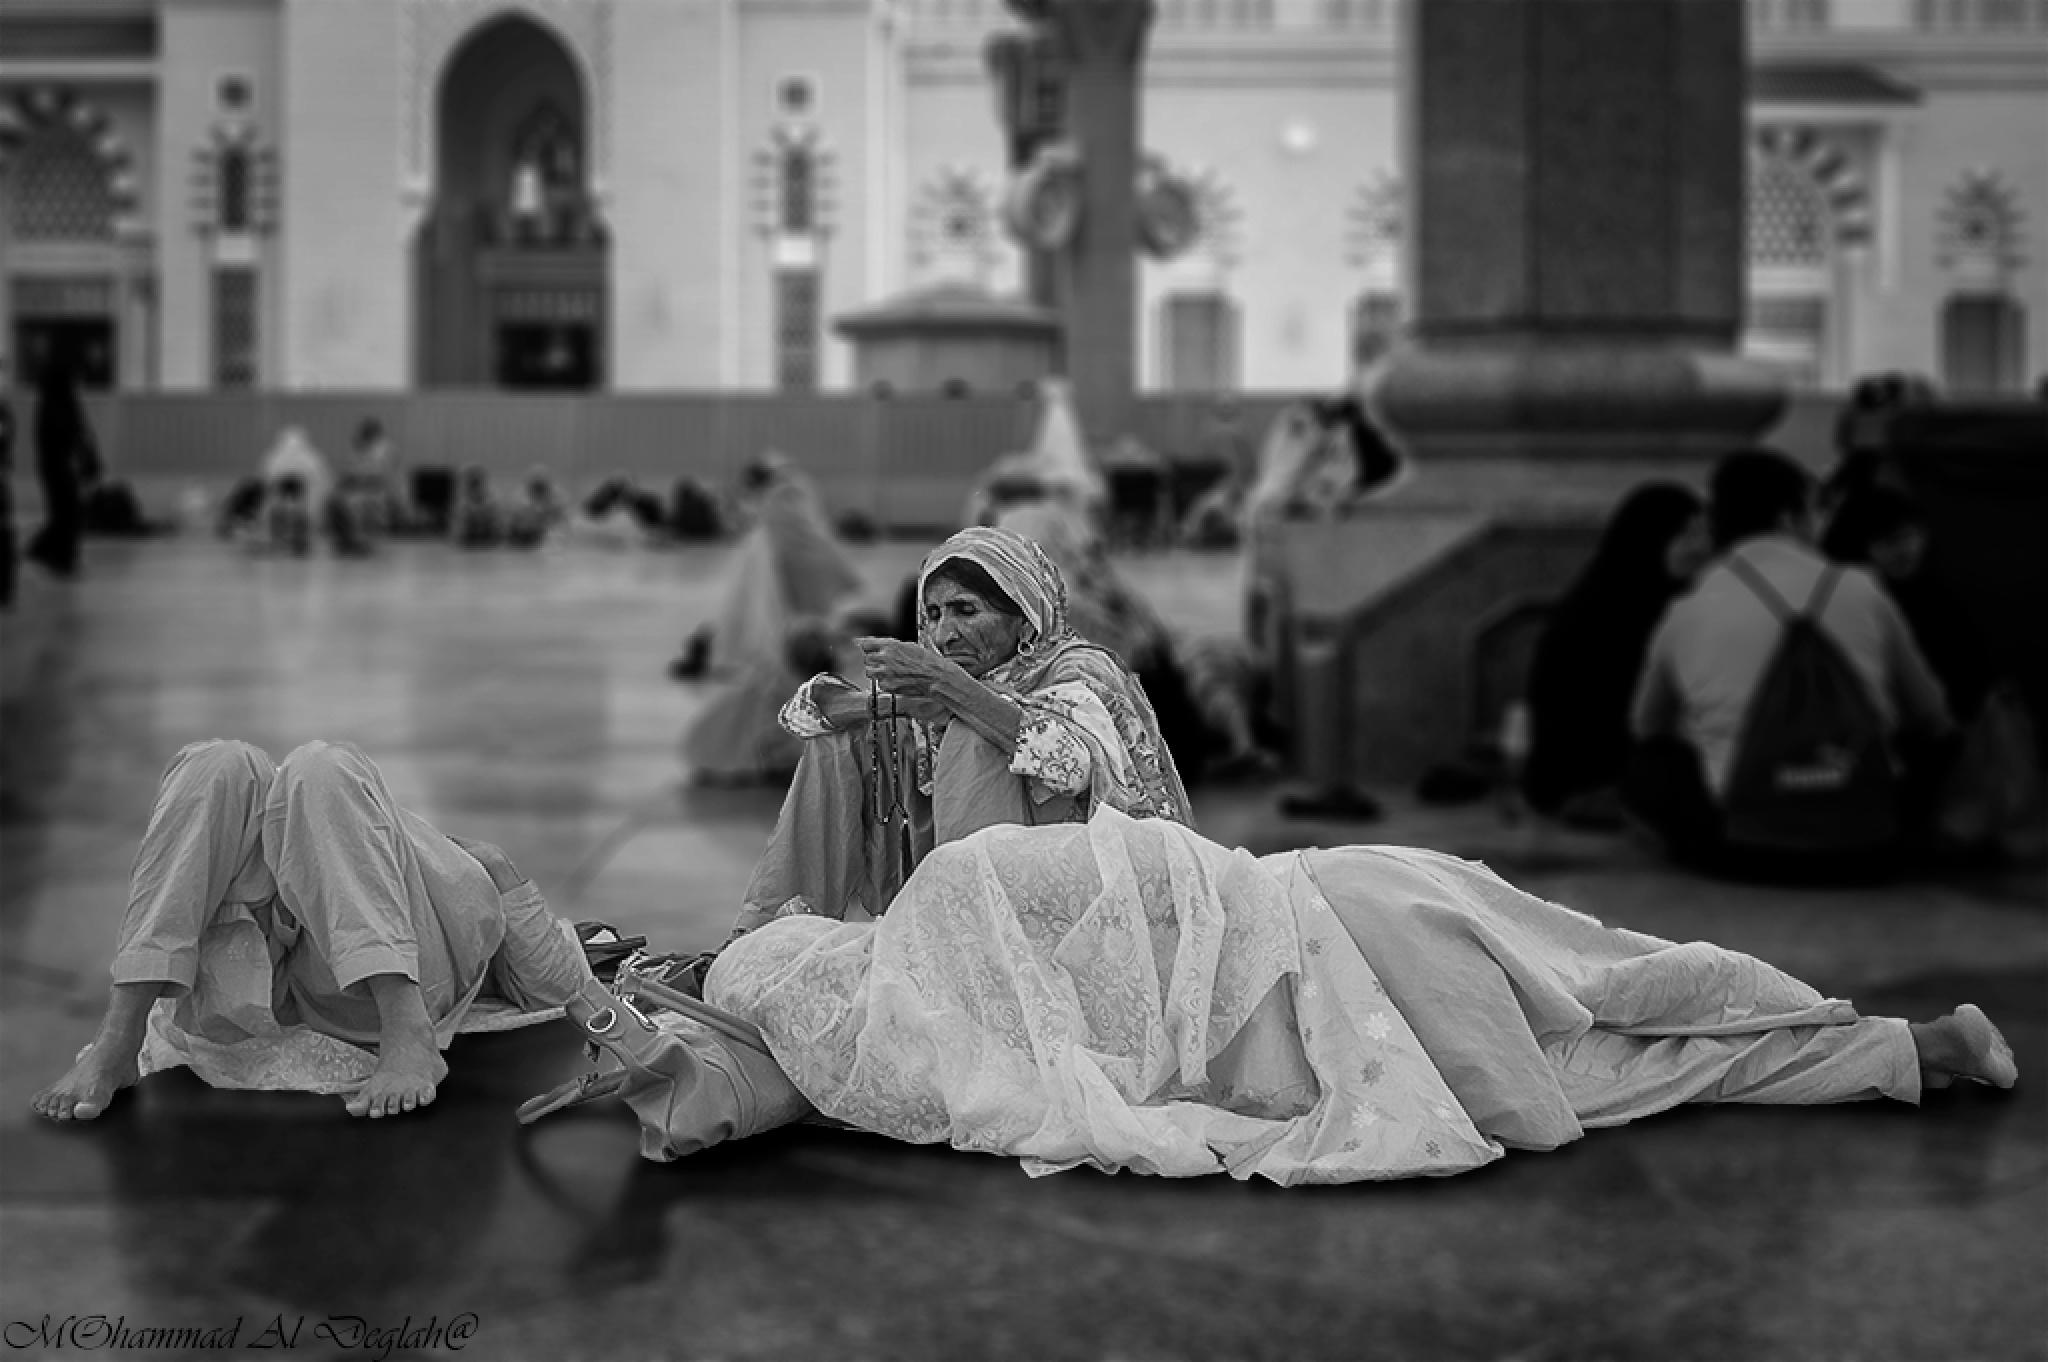 The Anchoress by Mohammad Al Deglah